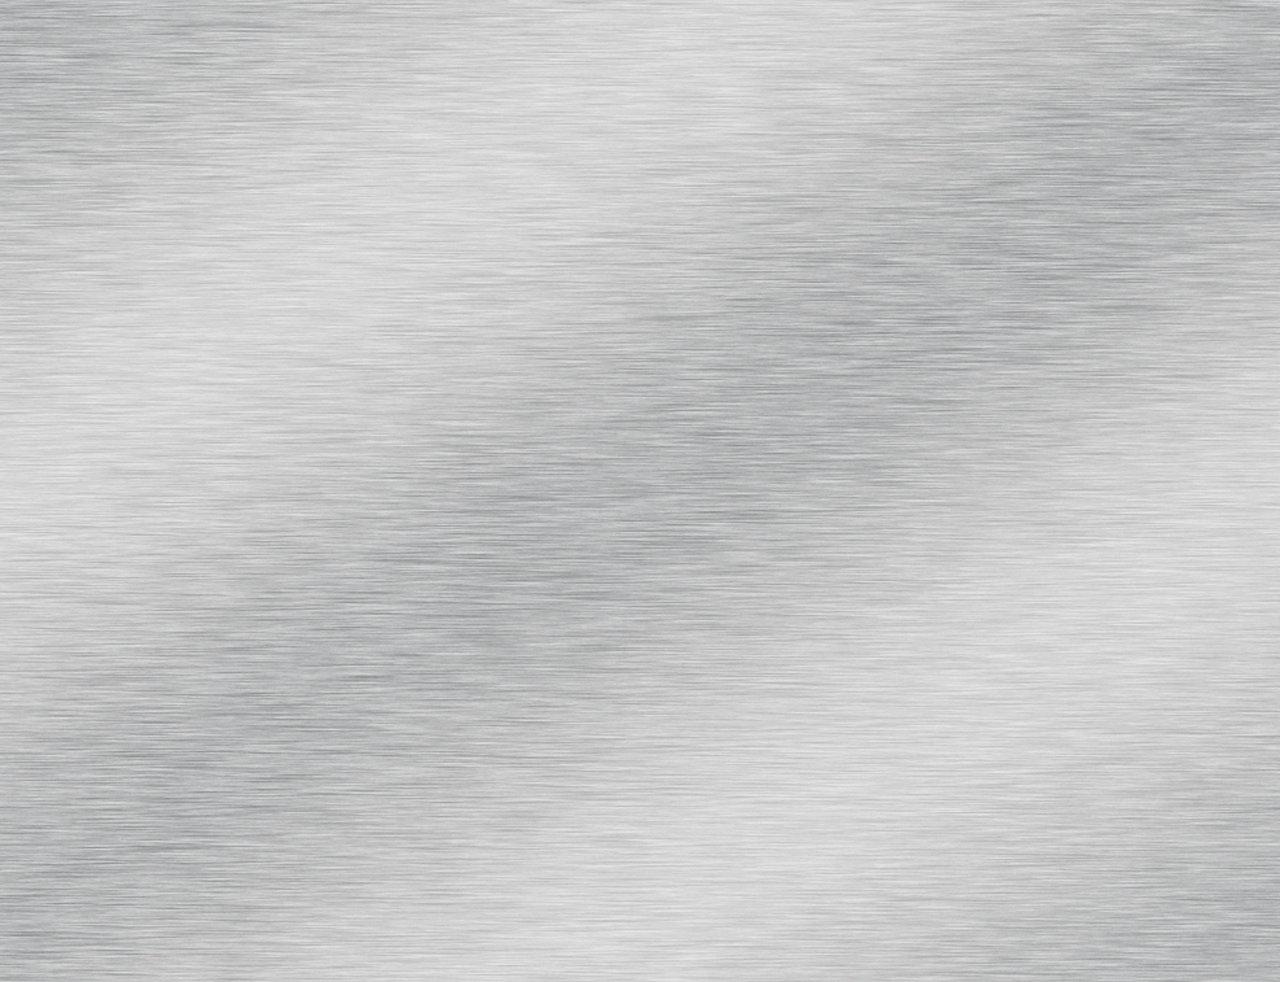 textures-wallpapers-my-brushed-metal-texture-by-jnuw-on-deviantart1.jpg